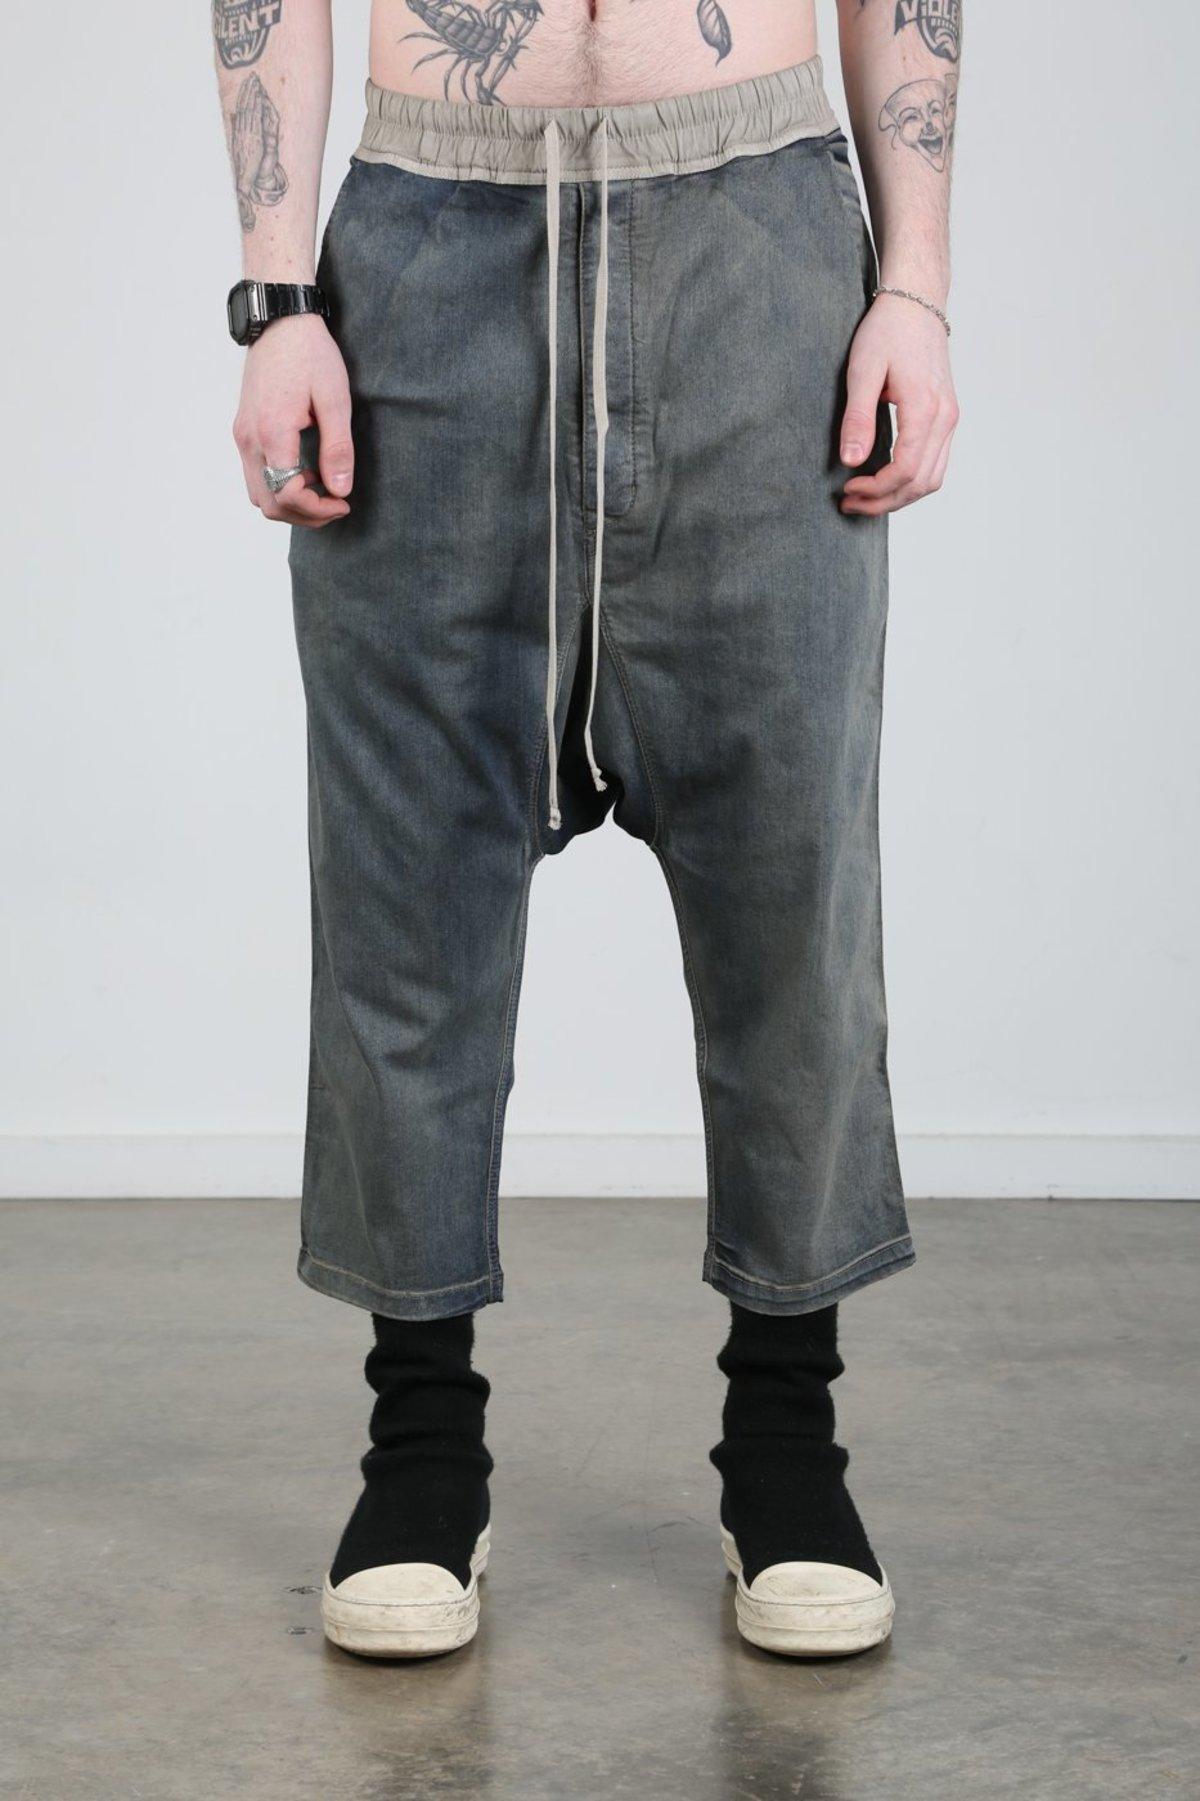 amateur cum on panties